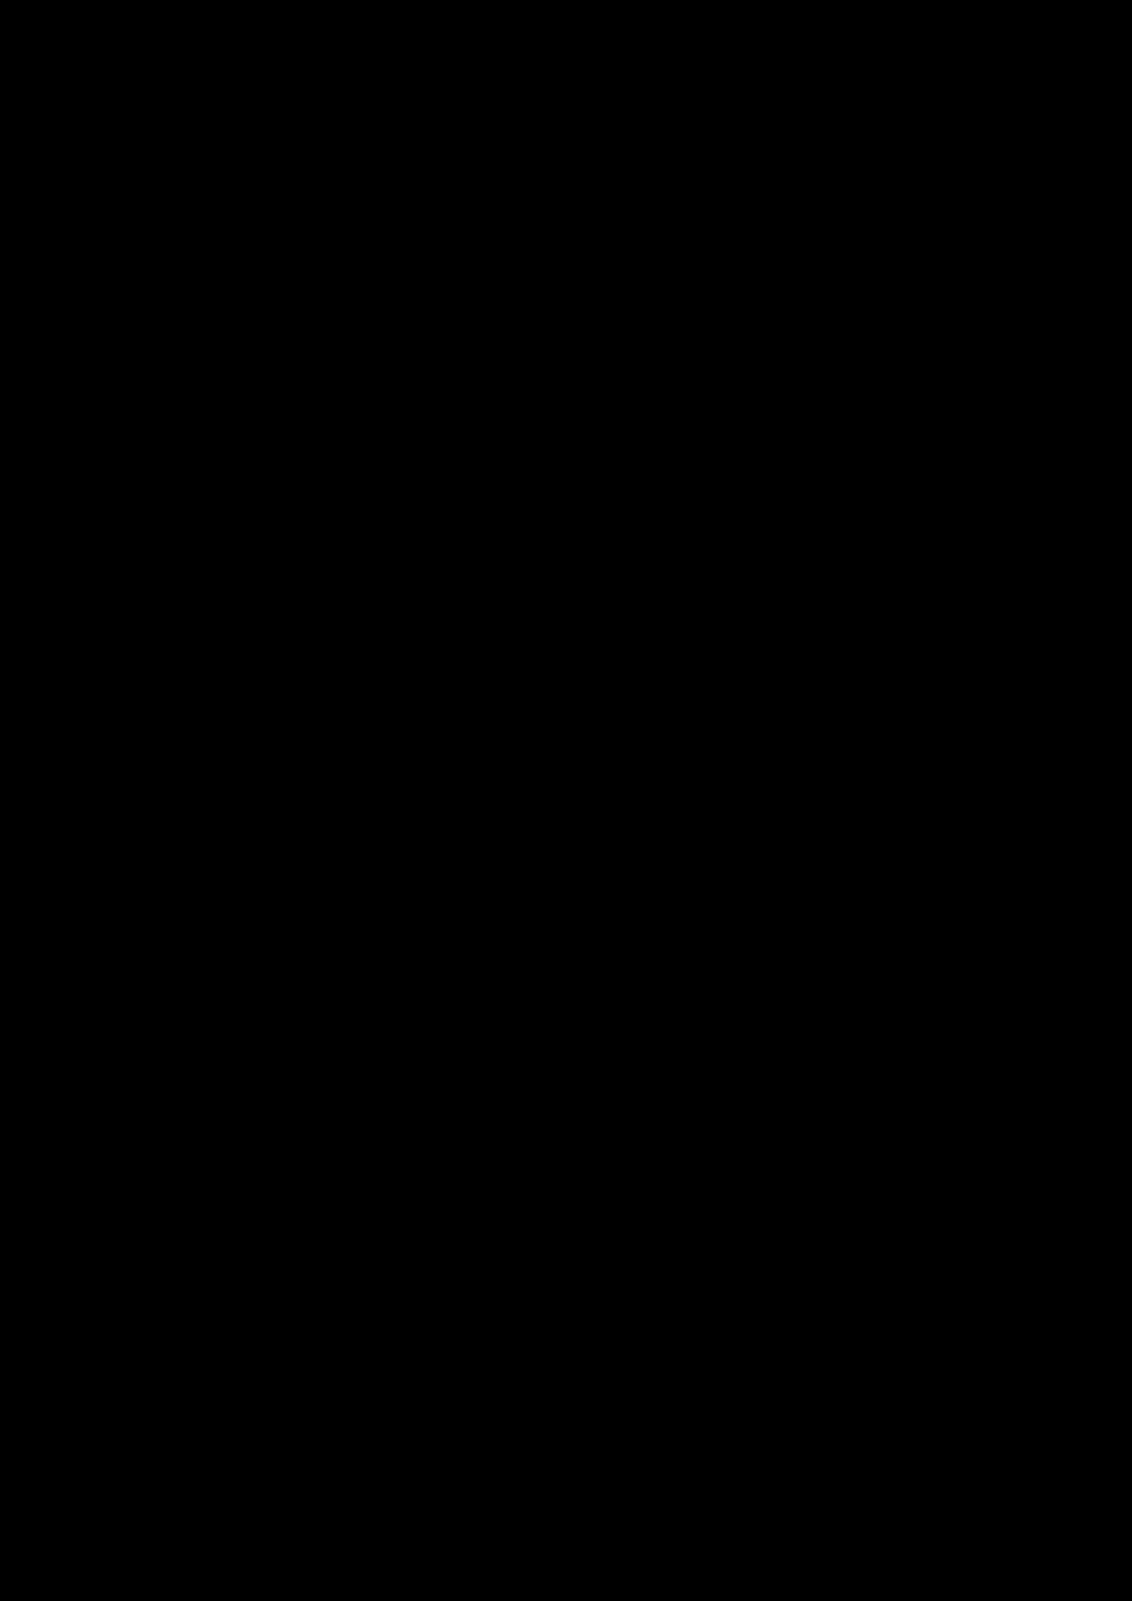 Ten lyubvi slide, Image 36